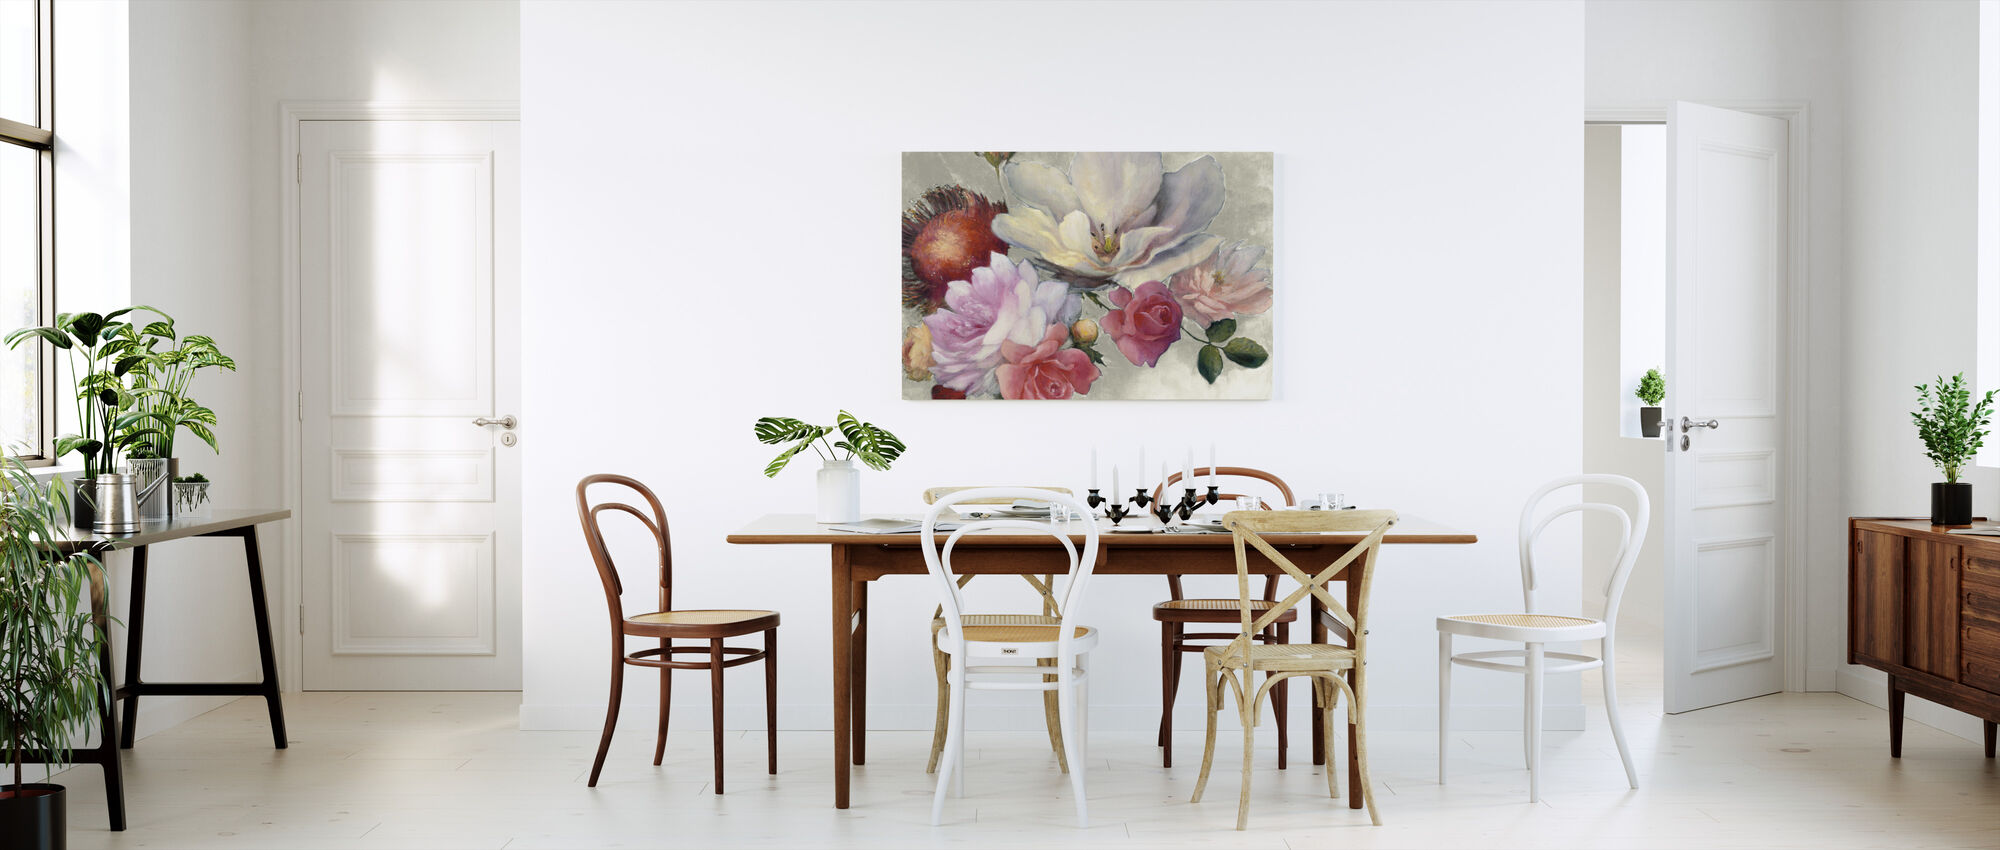 Flemish Fantasy on White - Canvas print - Kitchen